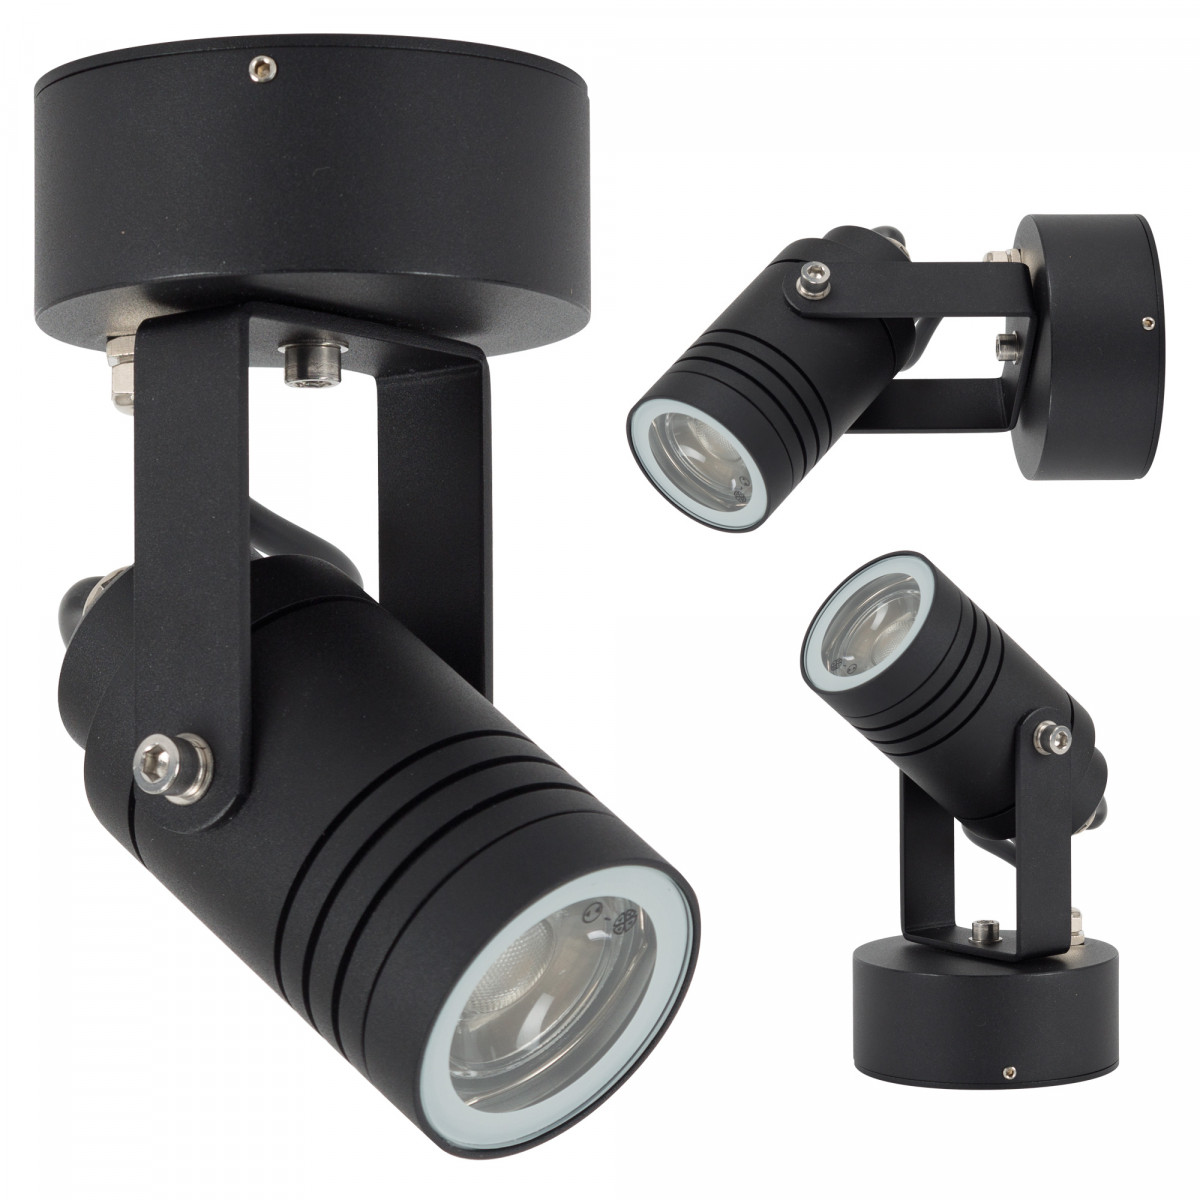 Beamer LED-Bodenstrahler Wandleuchte Schwarz GU 10   Nostalux.DE